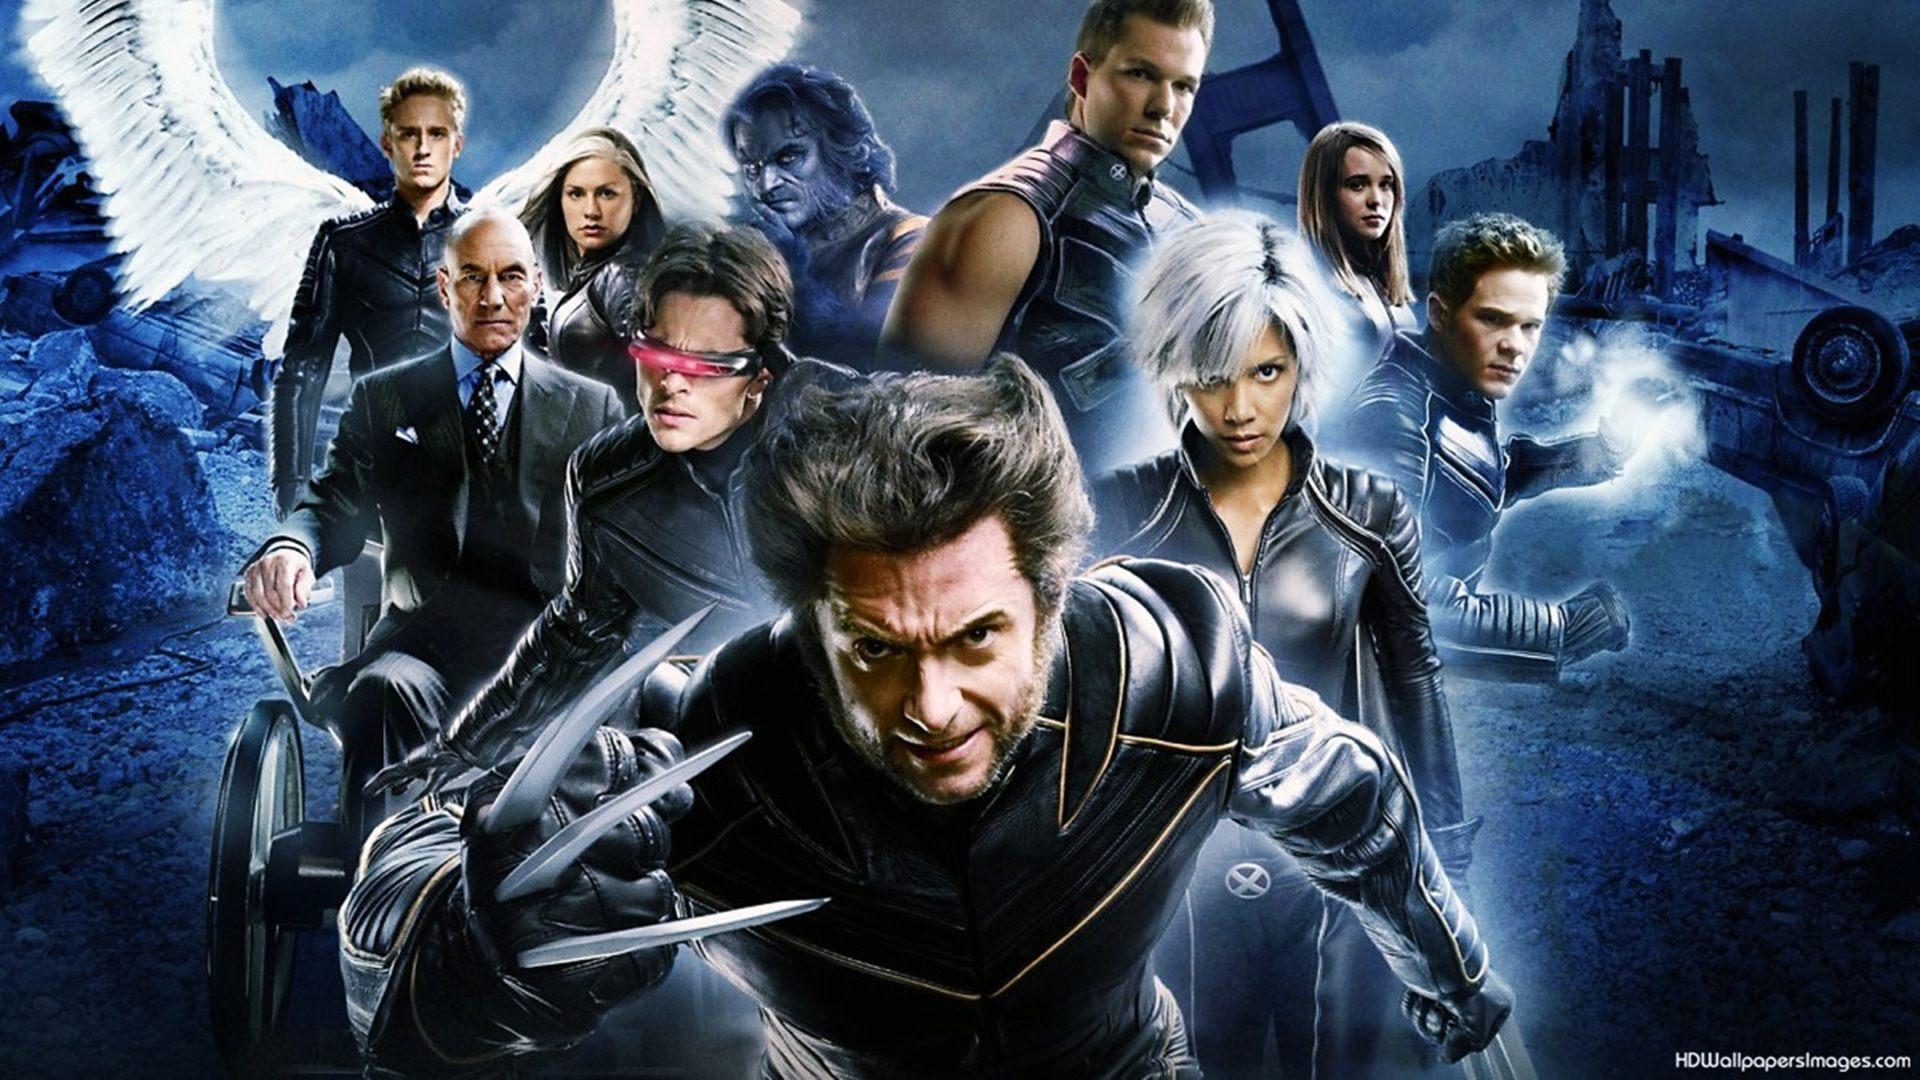 X Men Days Of Future Past HD Wallpaper.jpg